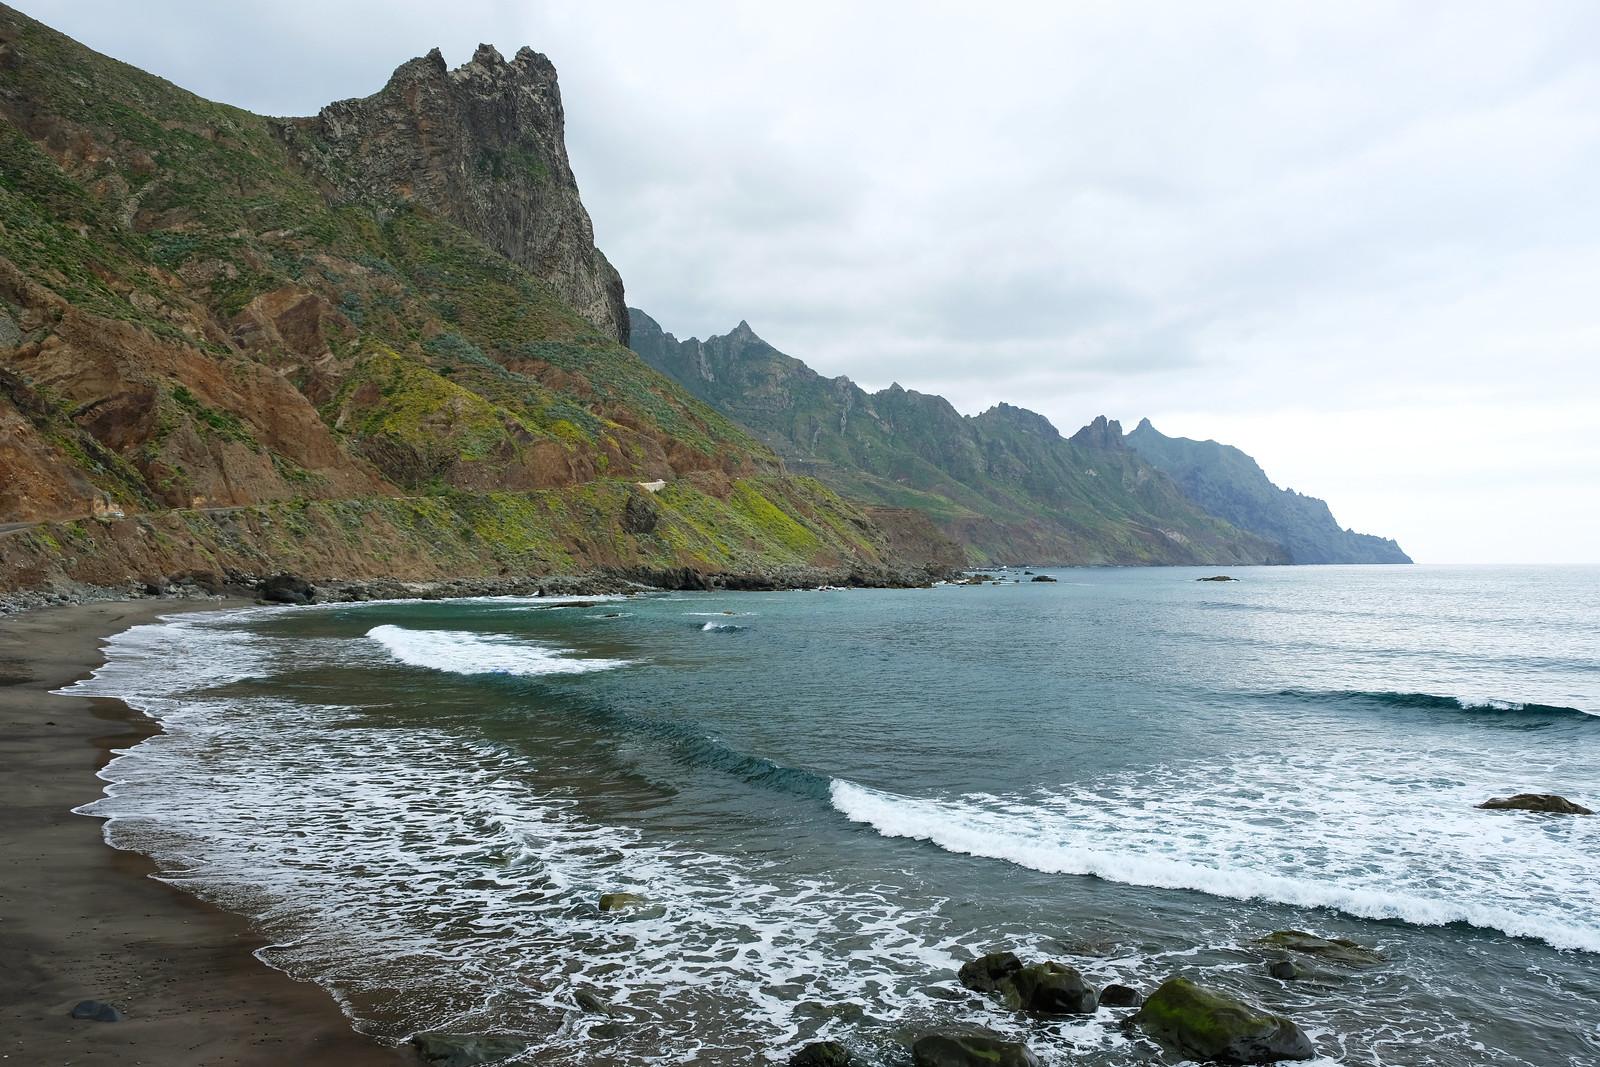 Playa de Roques de las Bodegas, Tenerife, Canary Islands, Spain